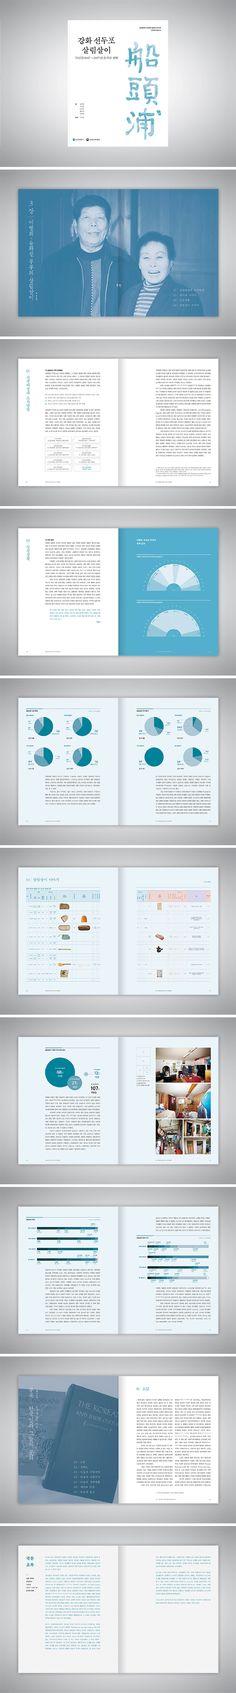 Client. National Folk Museum of Korea / Designer. Sym Phony, Jin Sunmi, Kim Jeayoung #디자인 #편집디자인 #편집 #사보 #국립민속박물관 #보고서 #삼십칠도커뮤니케이션 #37도커뮤니케이션